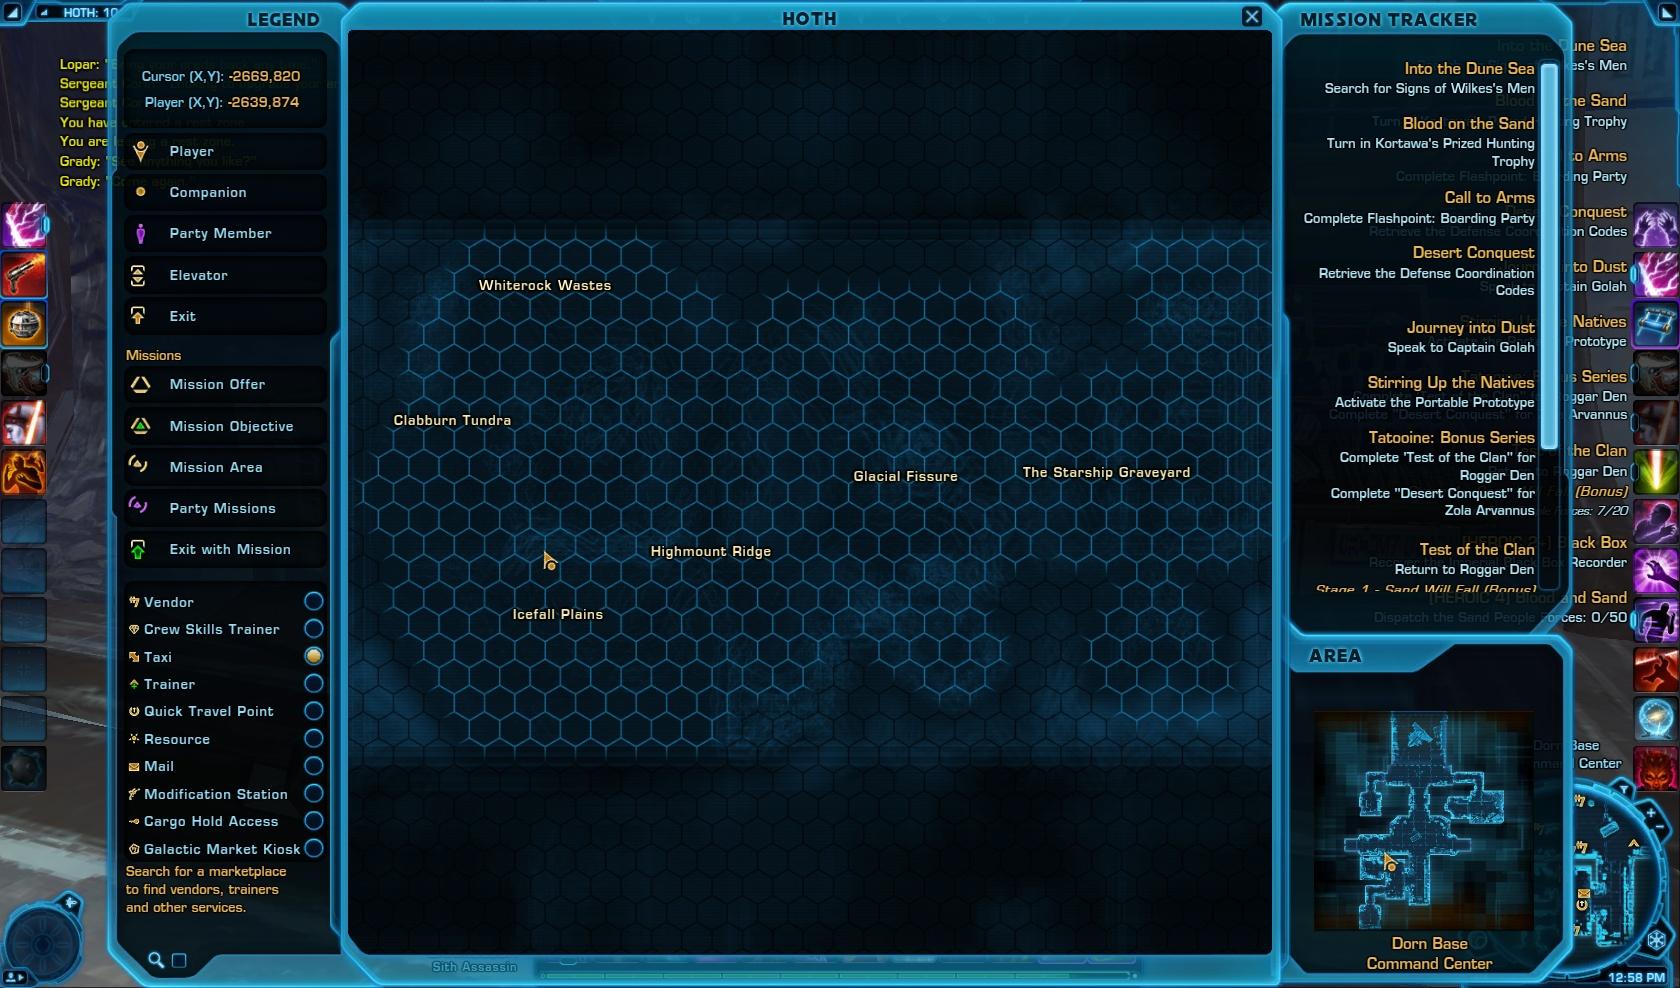 Grady - Social Items vendor Map View Hoth